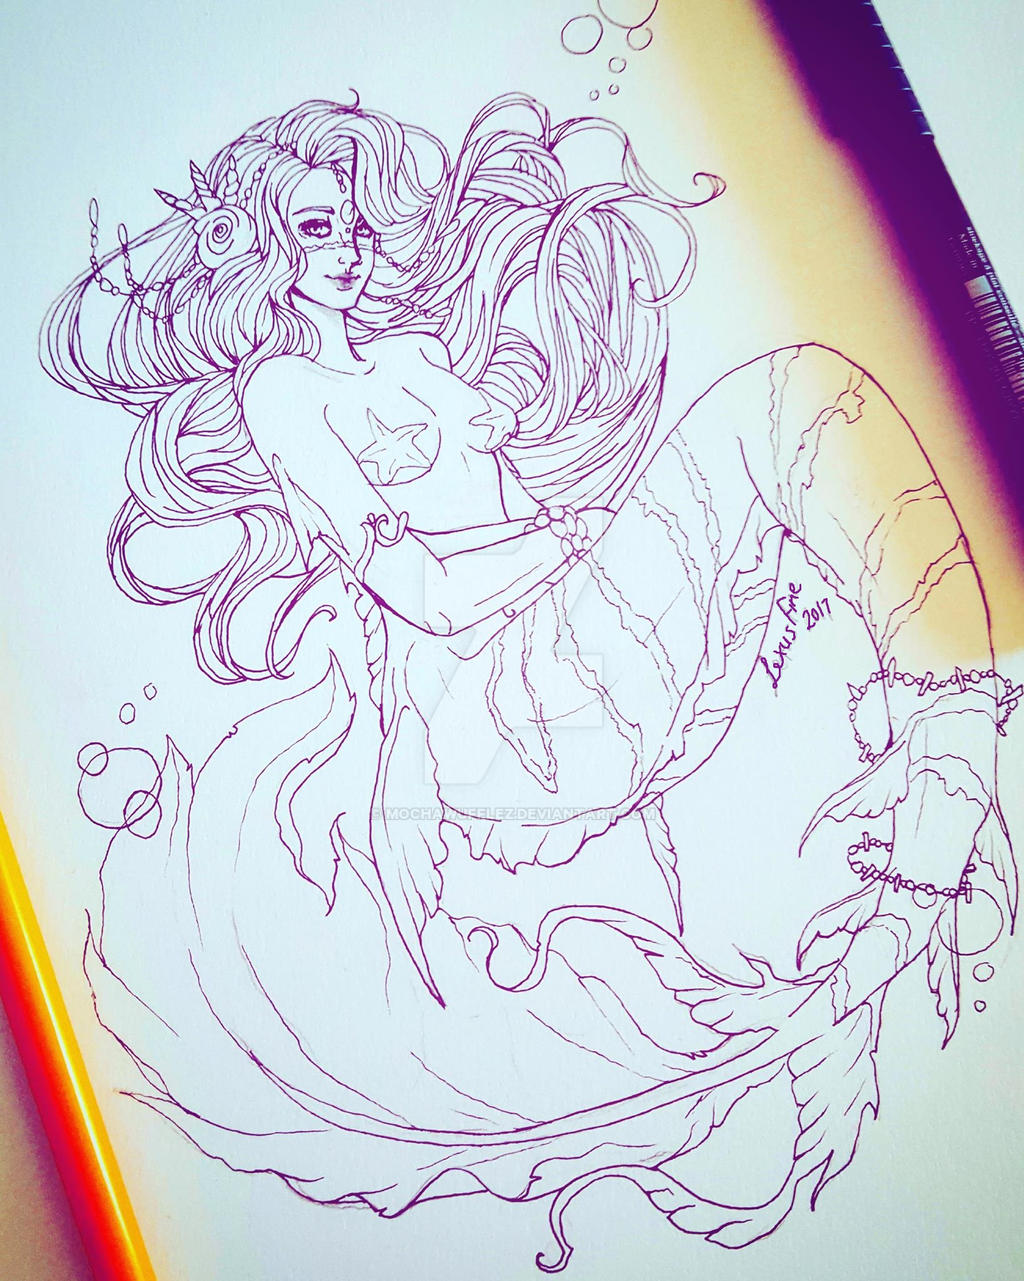 Mermaid Maiden by MochaWufflez